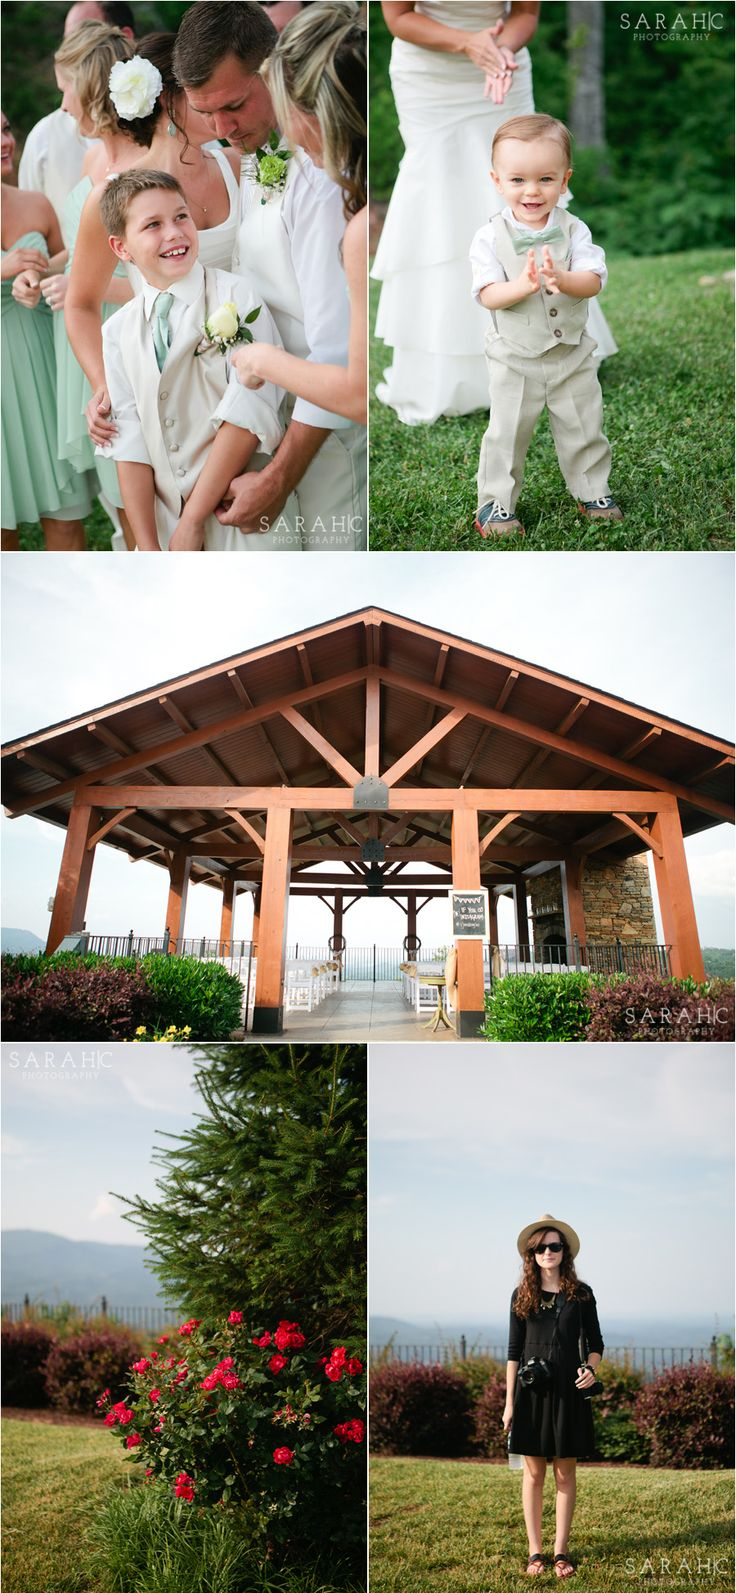 The Preserve Resort Wedding | Wedding Party Photos | Smoky Mountain Wedding Venue | Voted Knoxville's Best Wedding Photographer | Sarah C. Photography